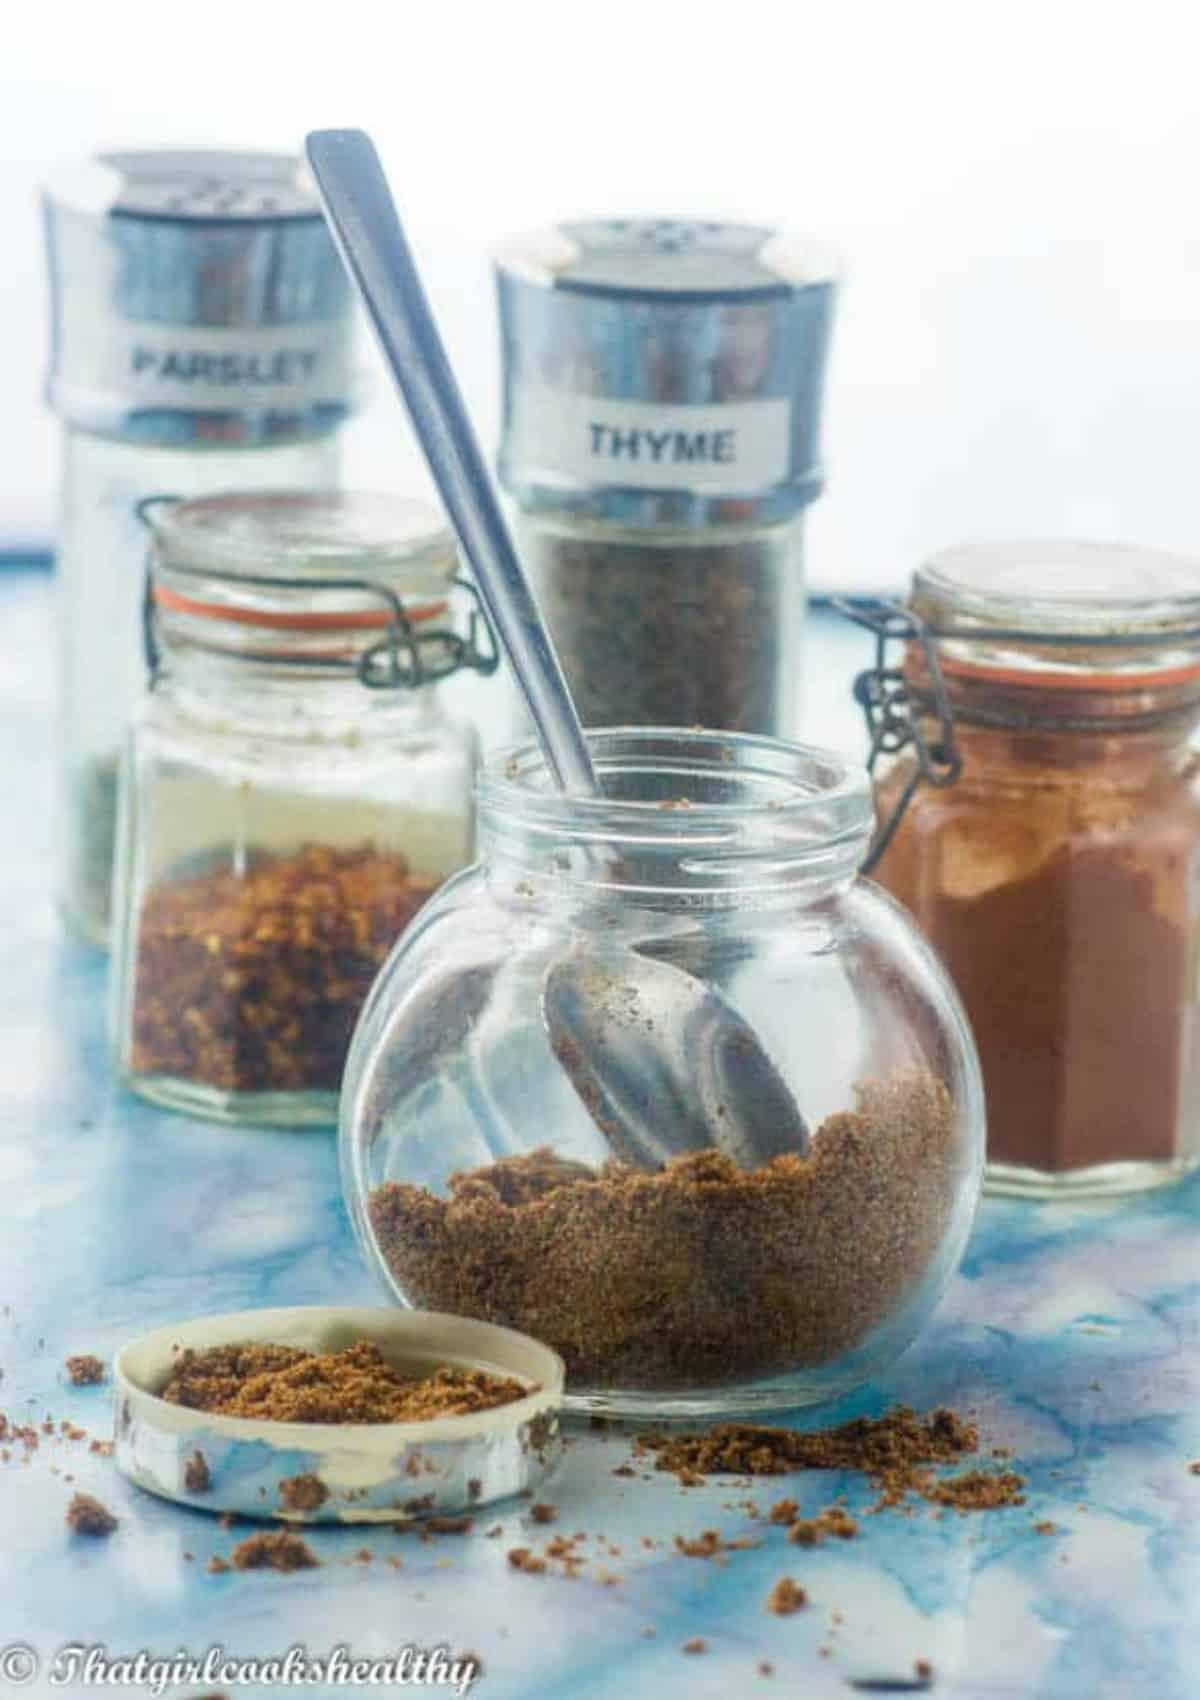 Seasoning with a teaspoon